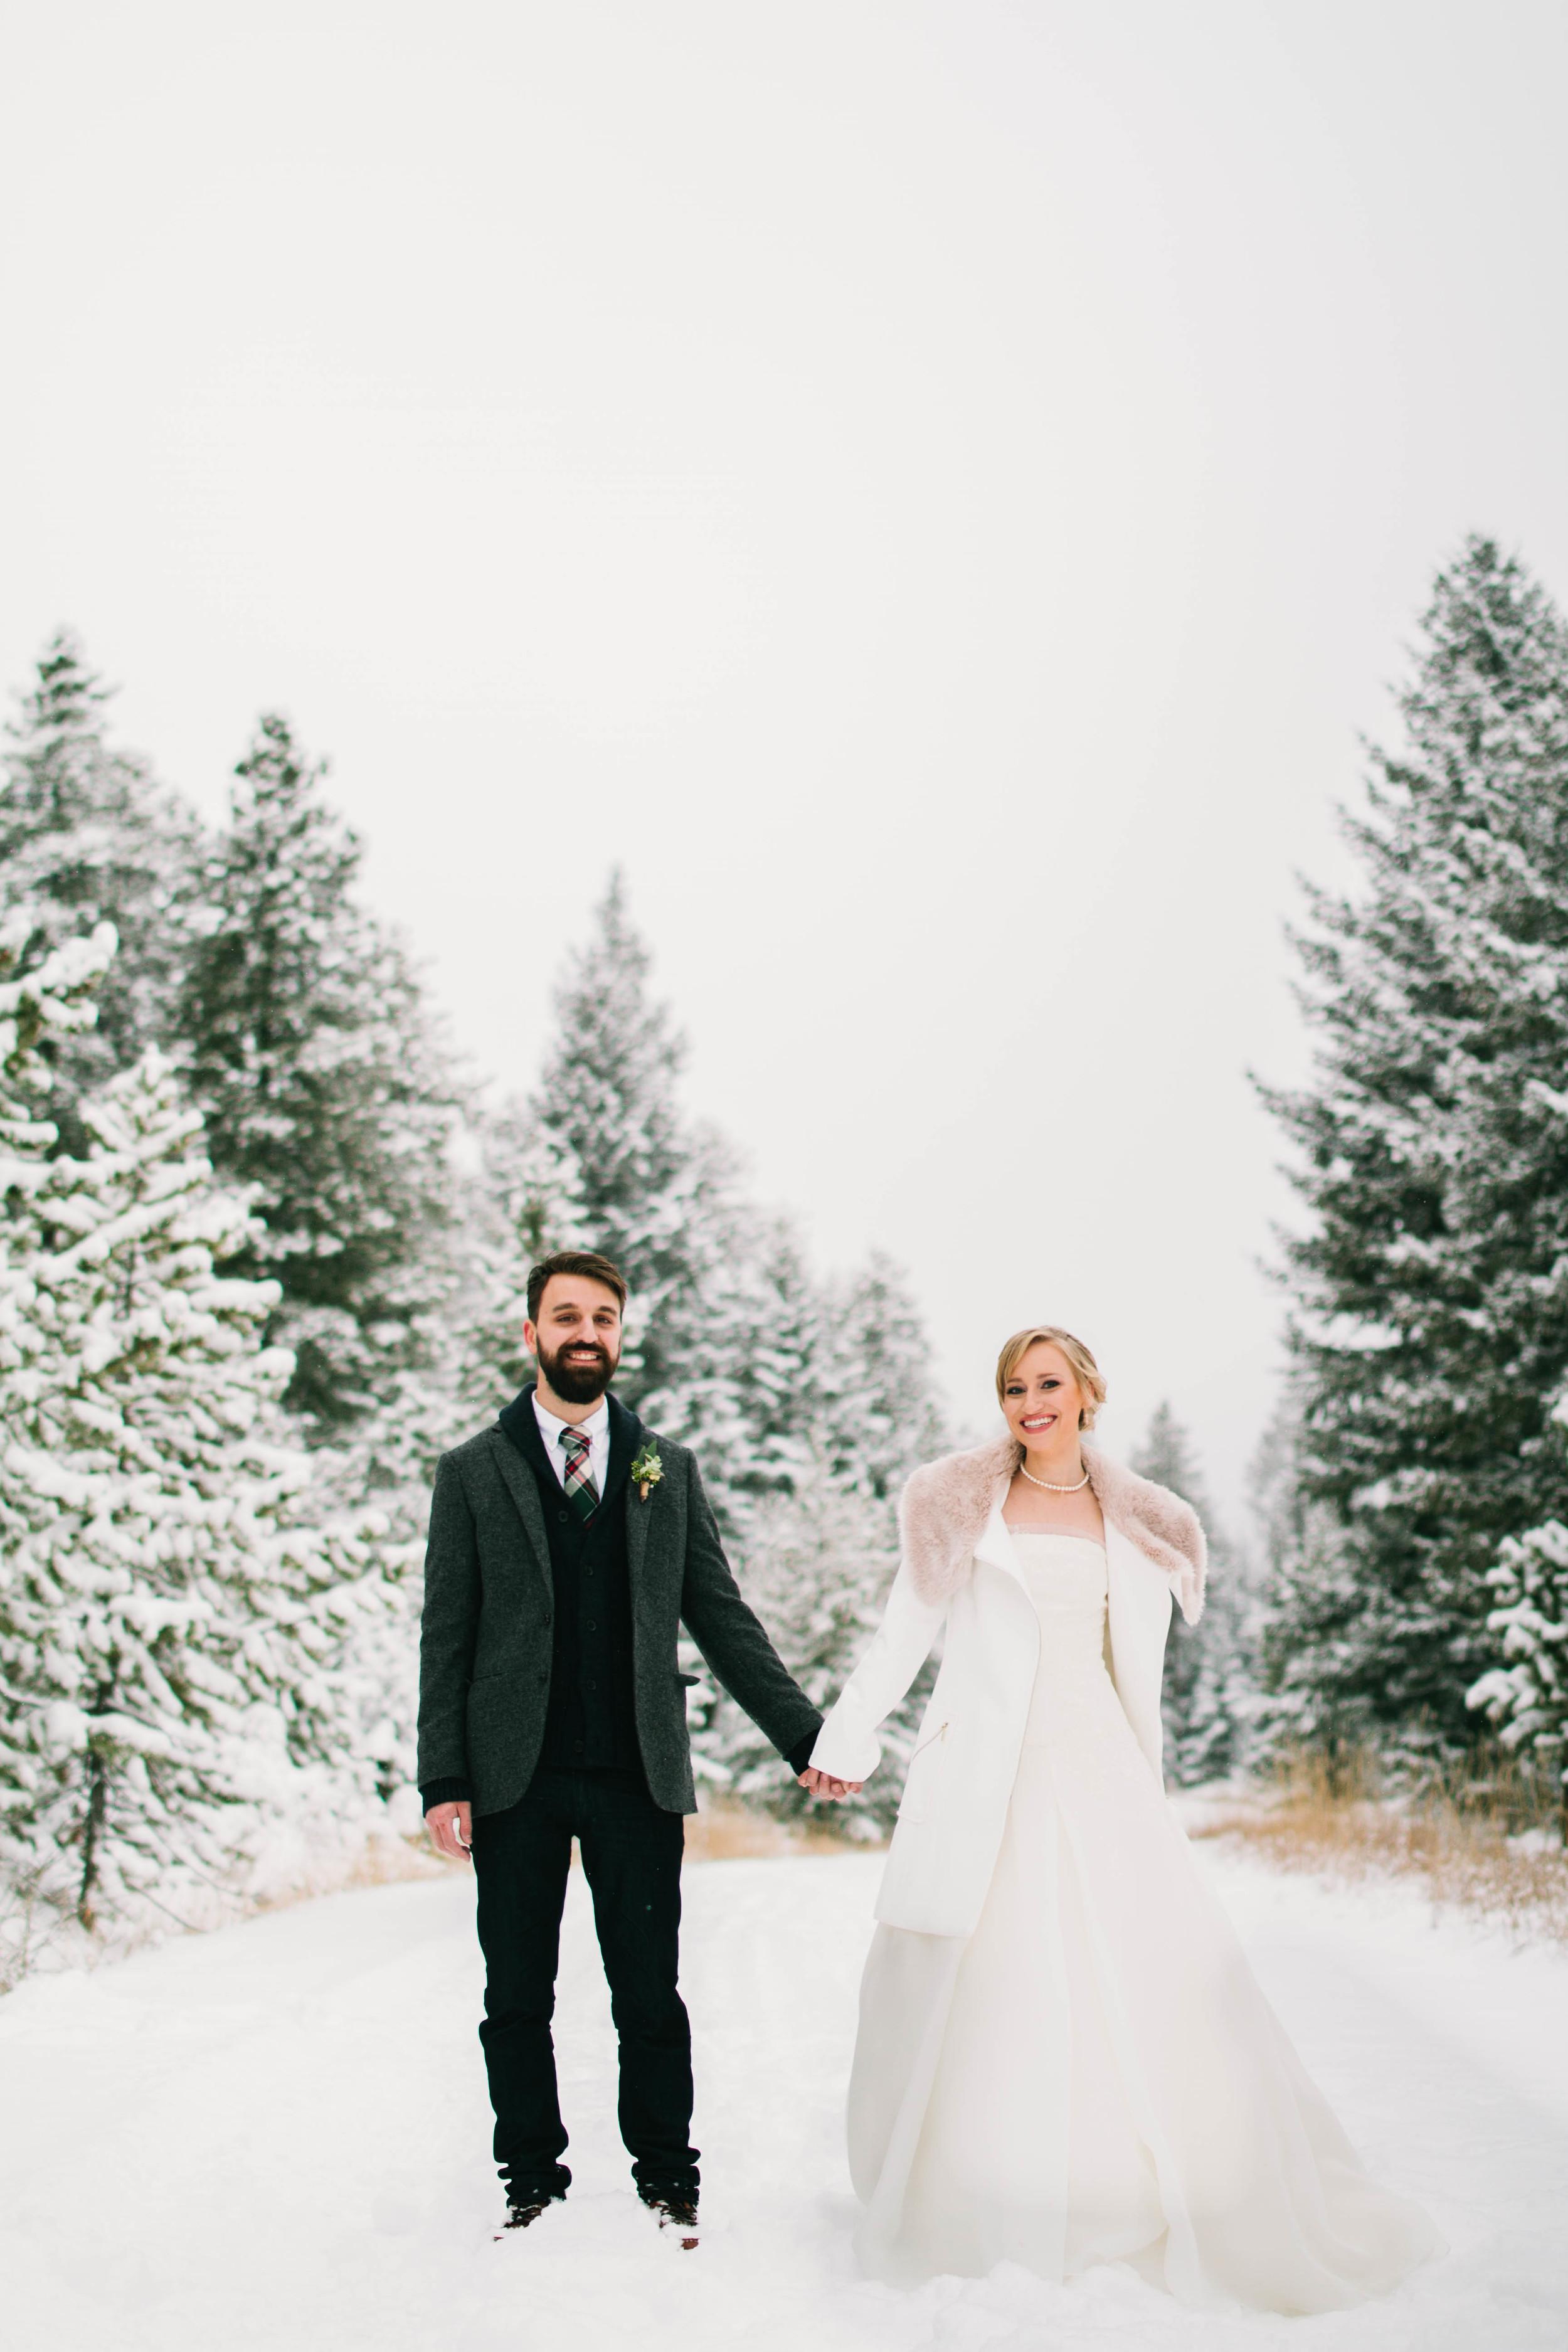 Bonin Wedding - Madeleine Bonin Photography-5777.jpg